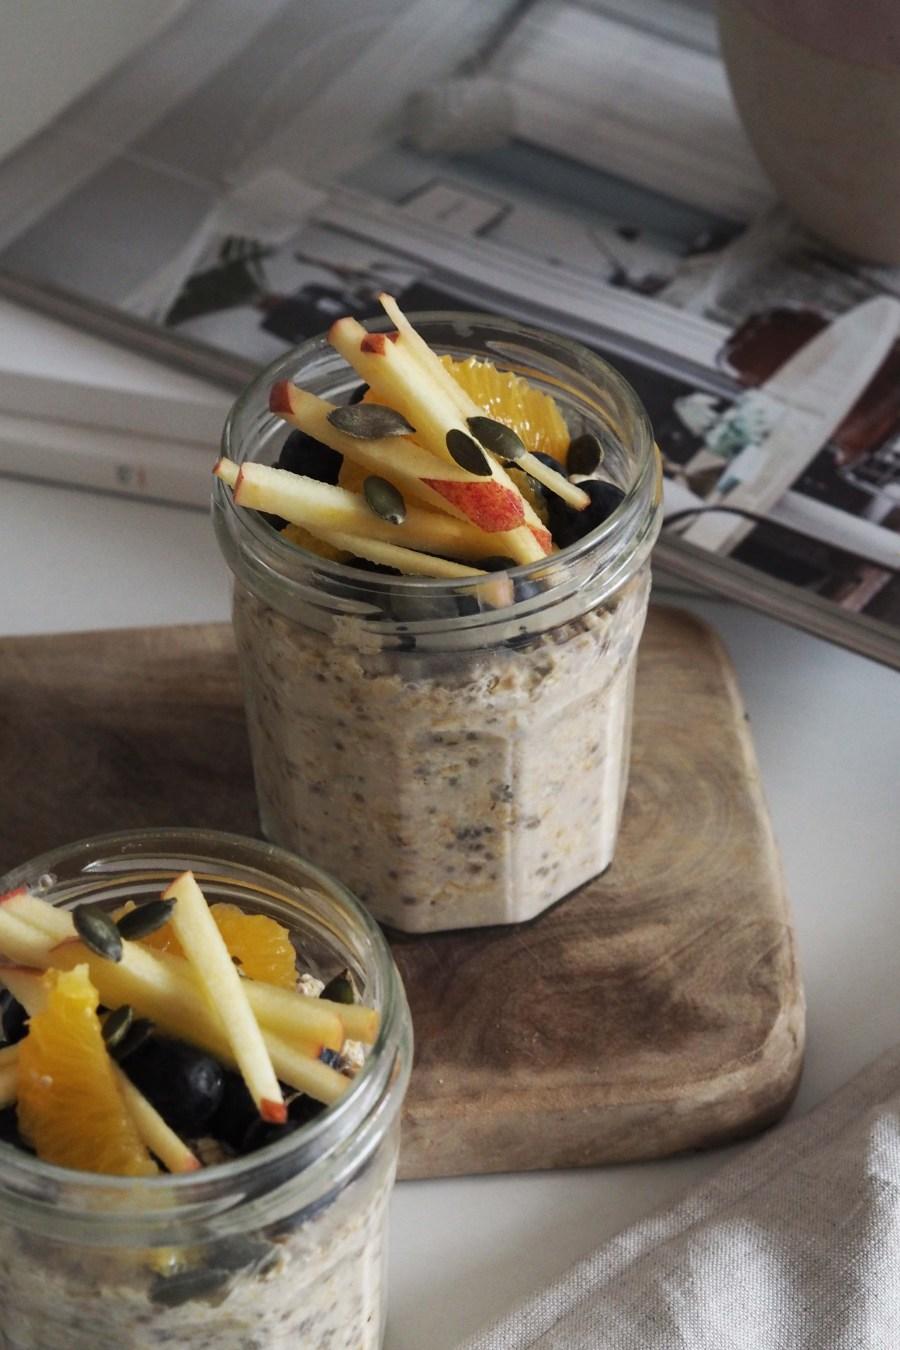 healthy eating: chia seed breakfast bowl recipe